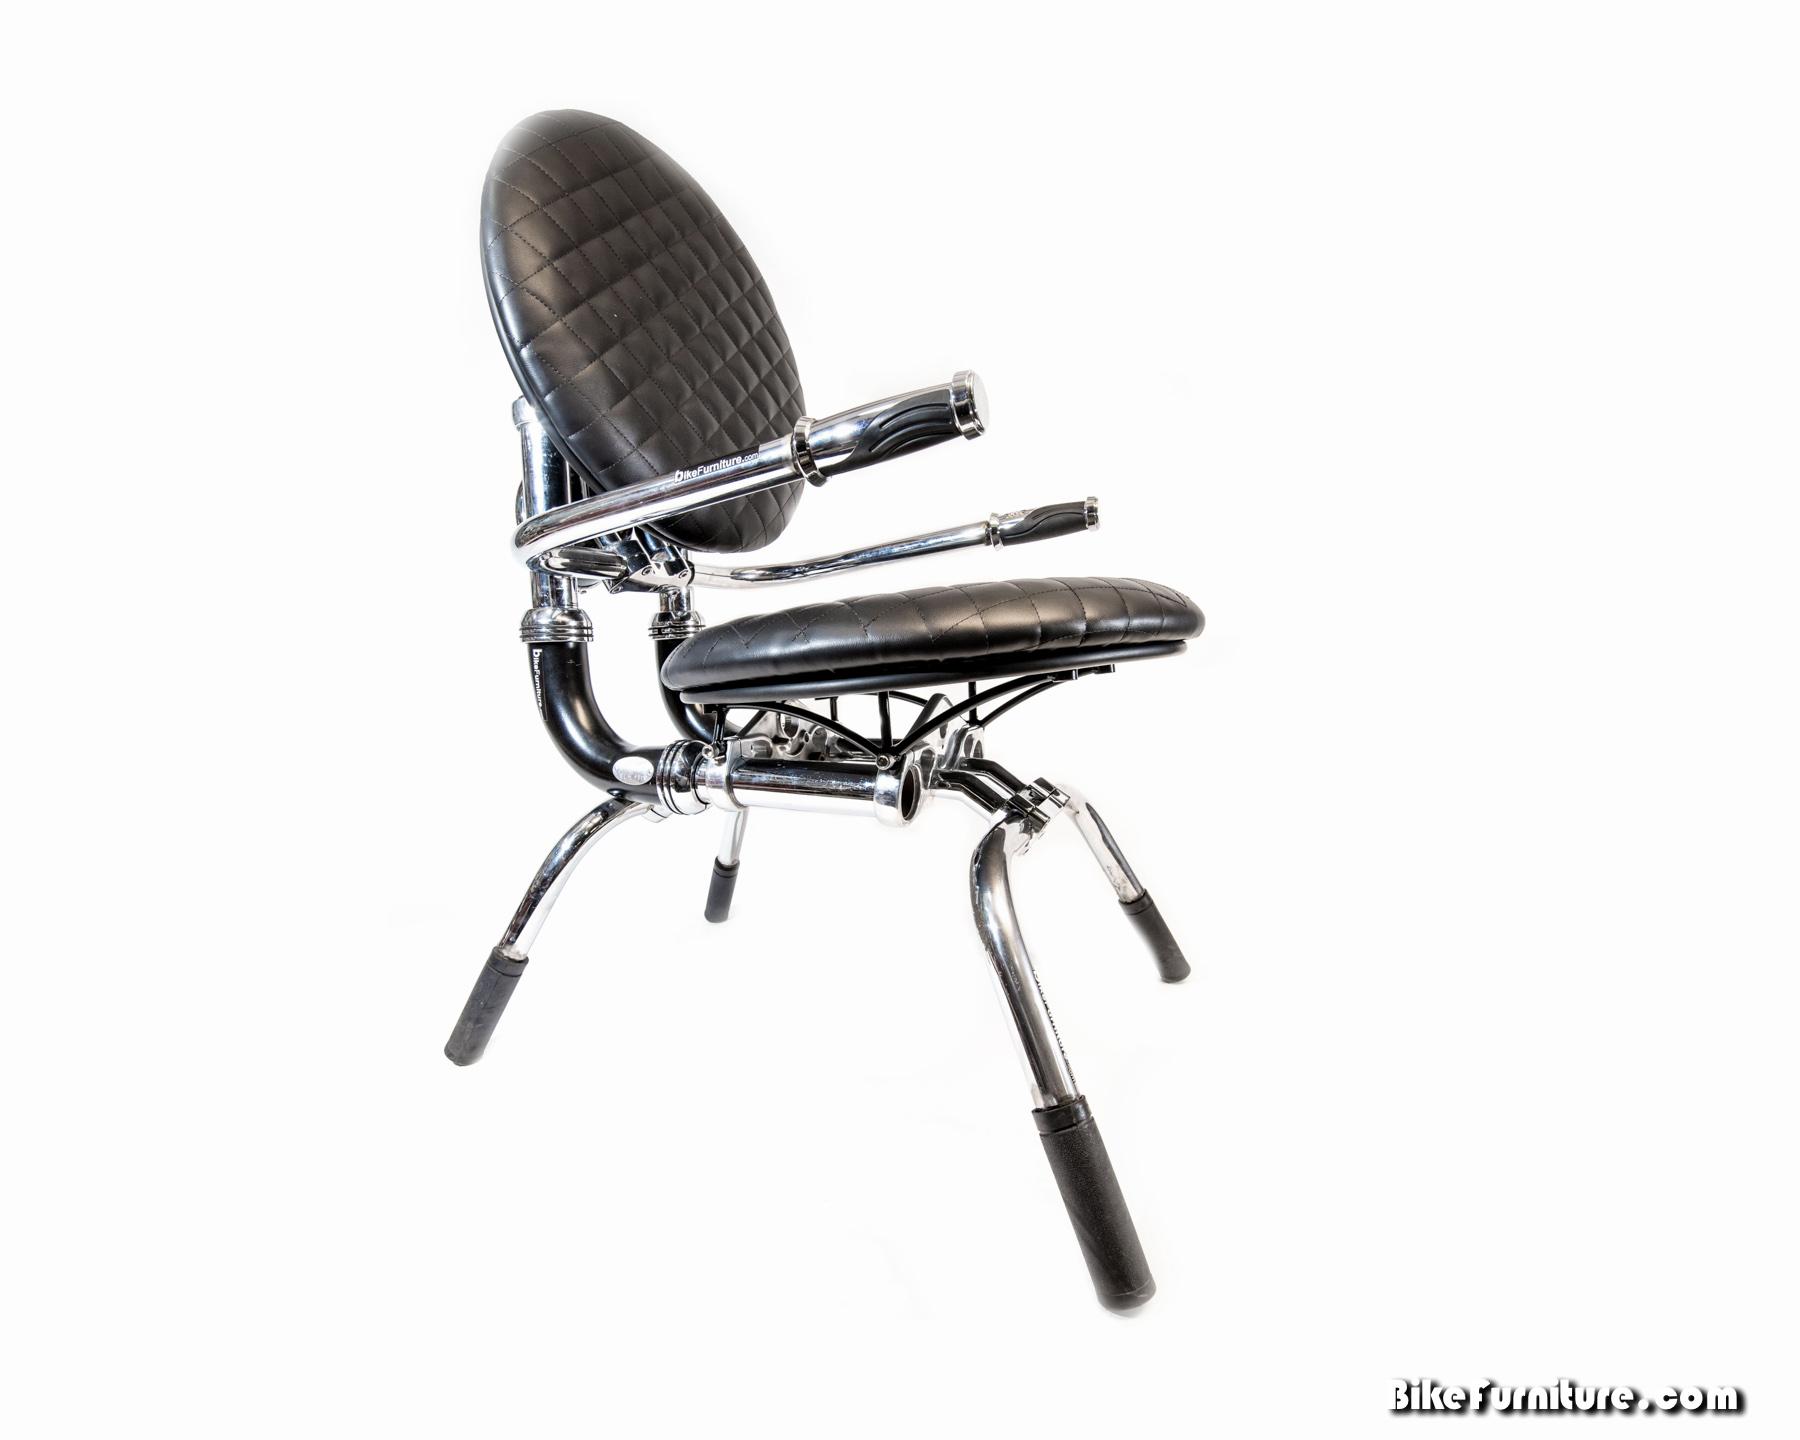 moto_chair_nmu-5614.jpg